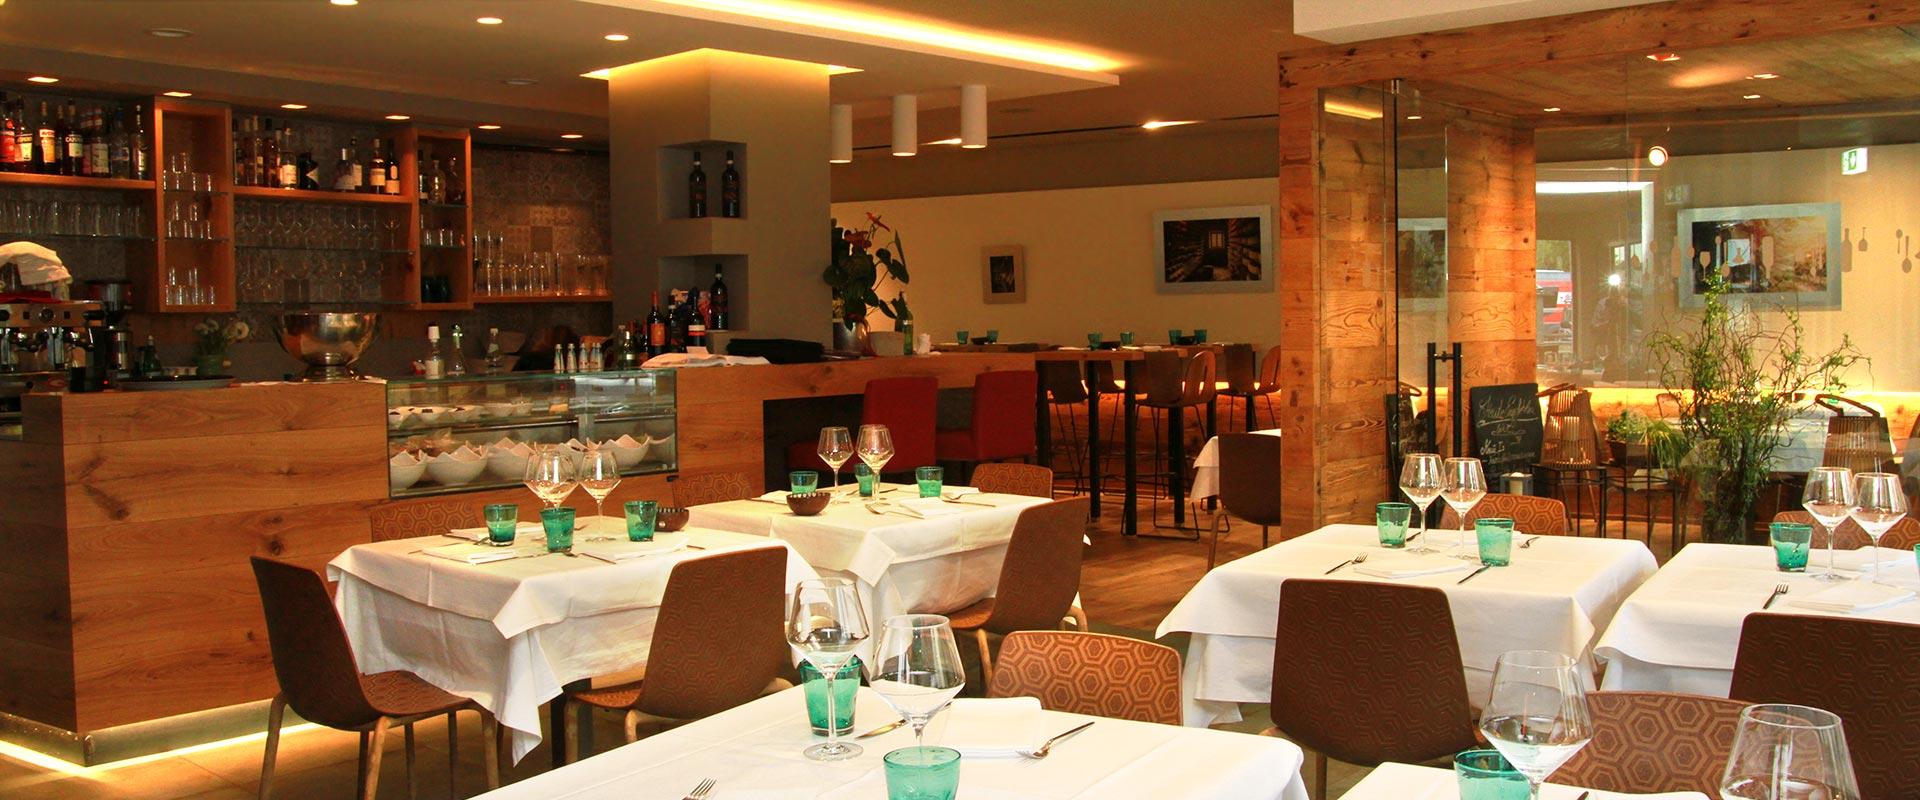 Italienisches Restaurant La Vineria Gusto Italiano